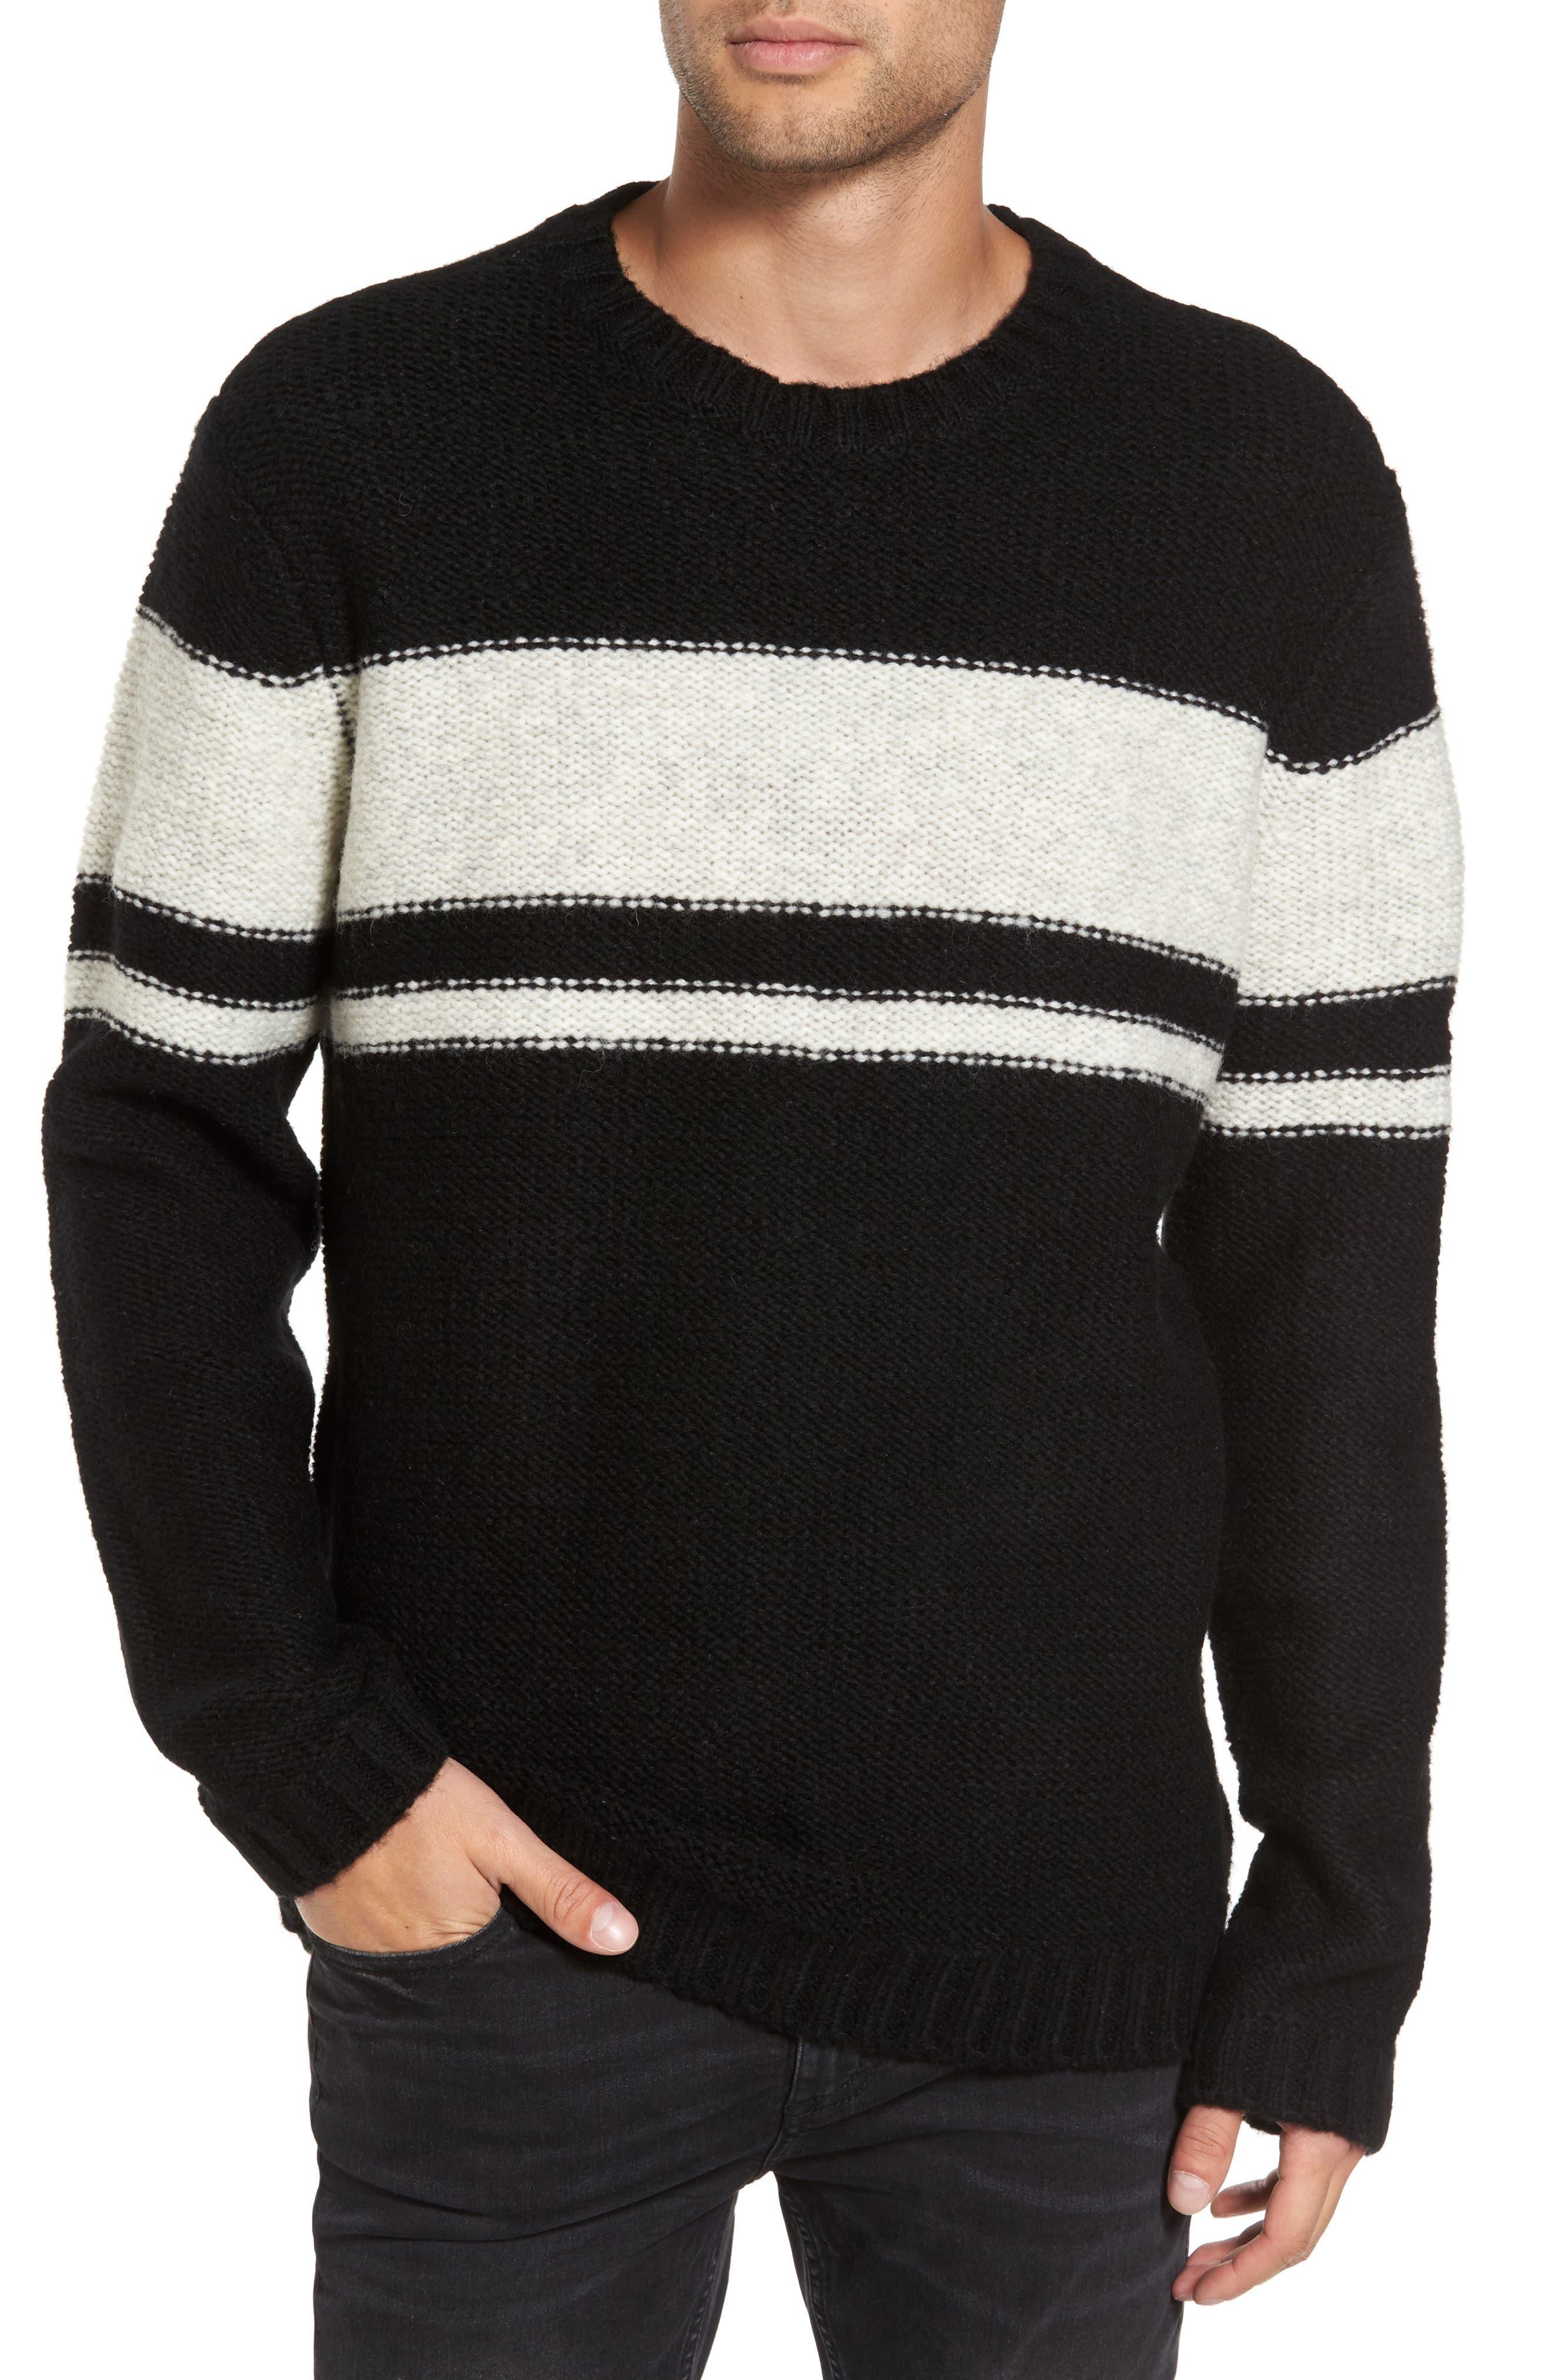 Blume Sweater,                             Main thumbnail 1, color,                             001